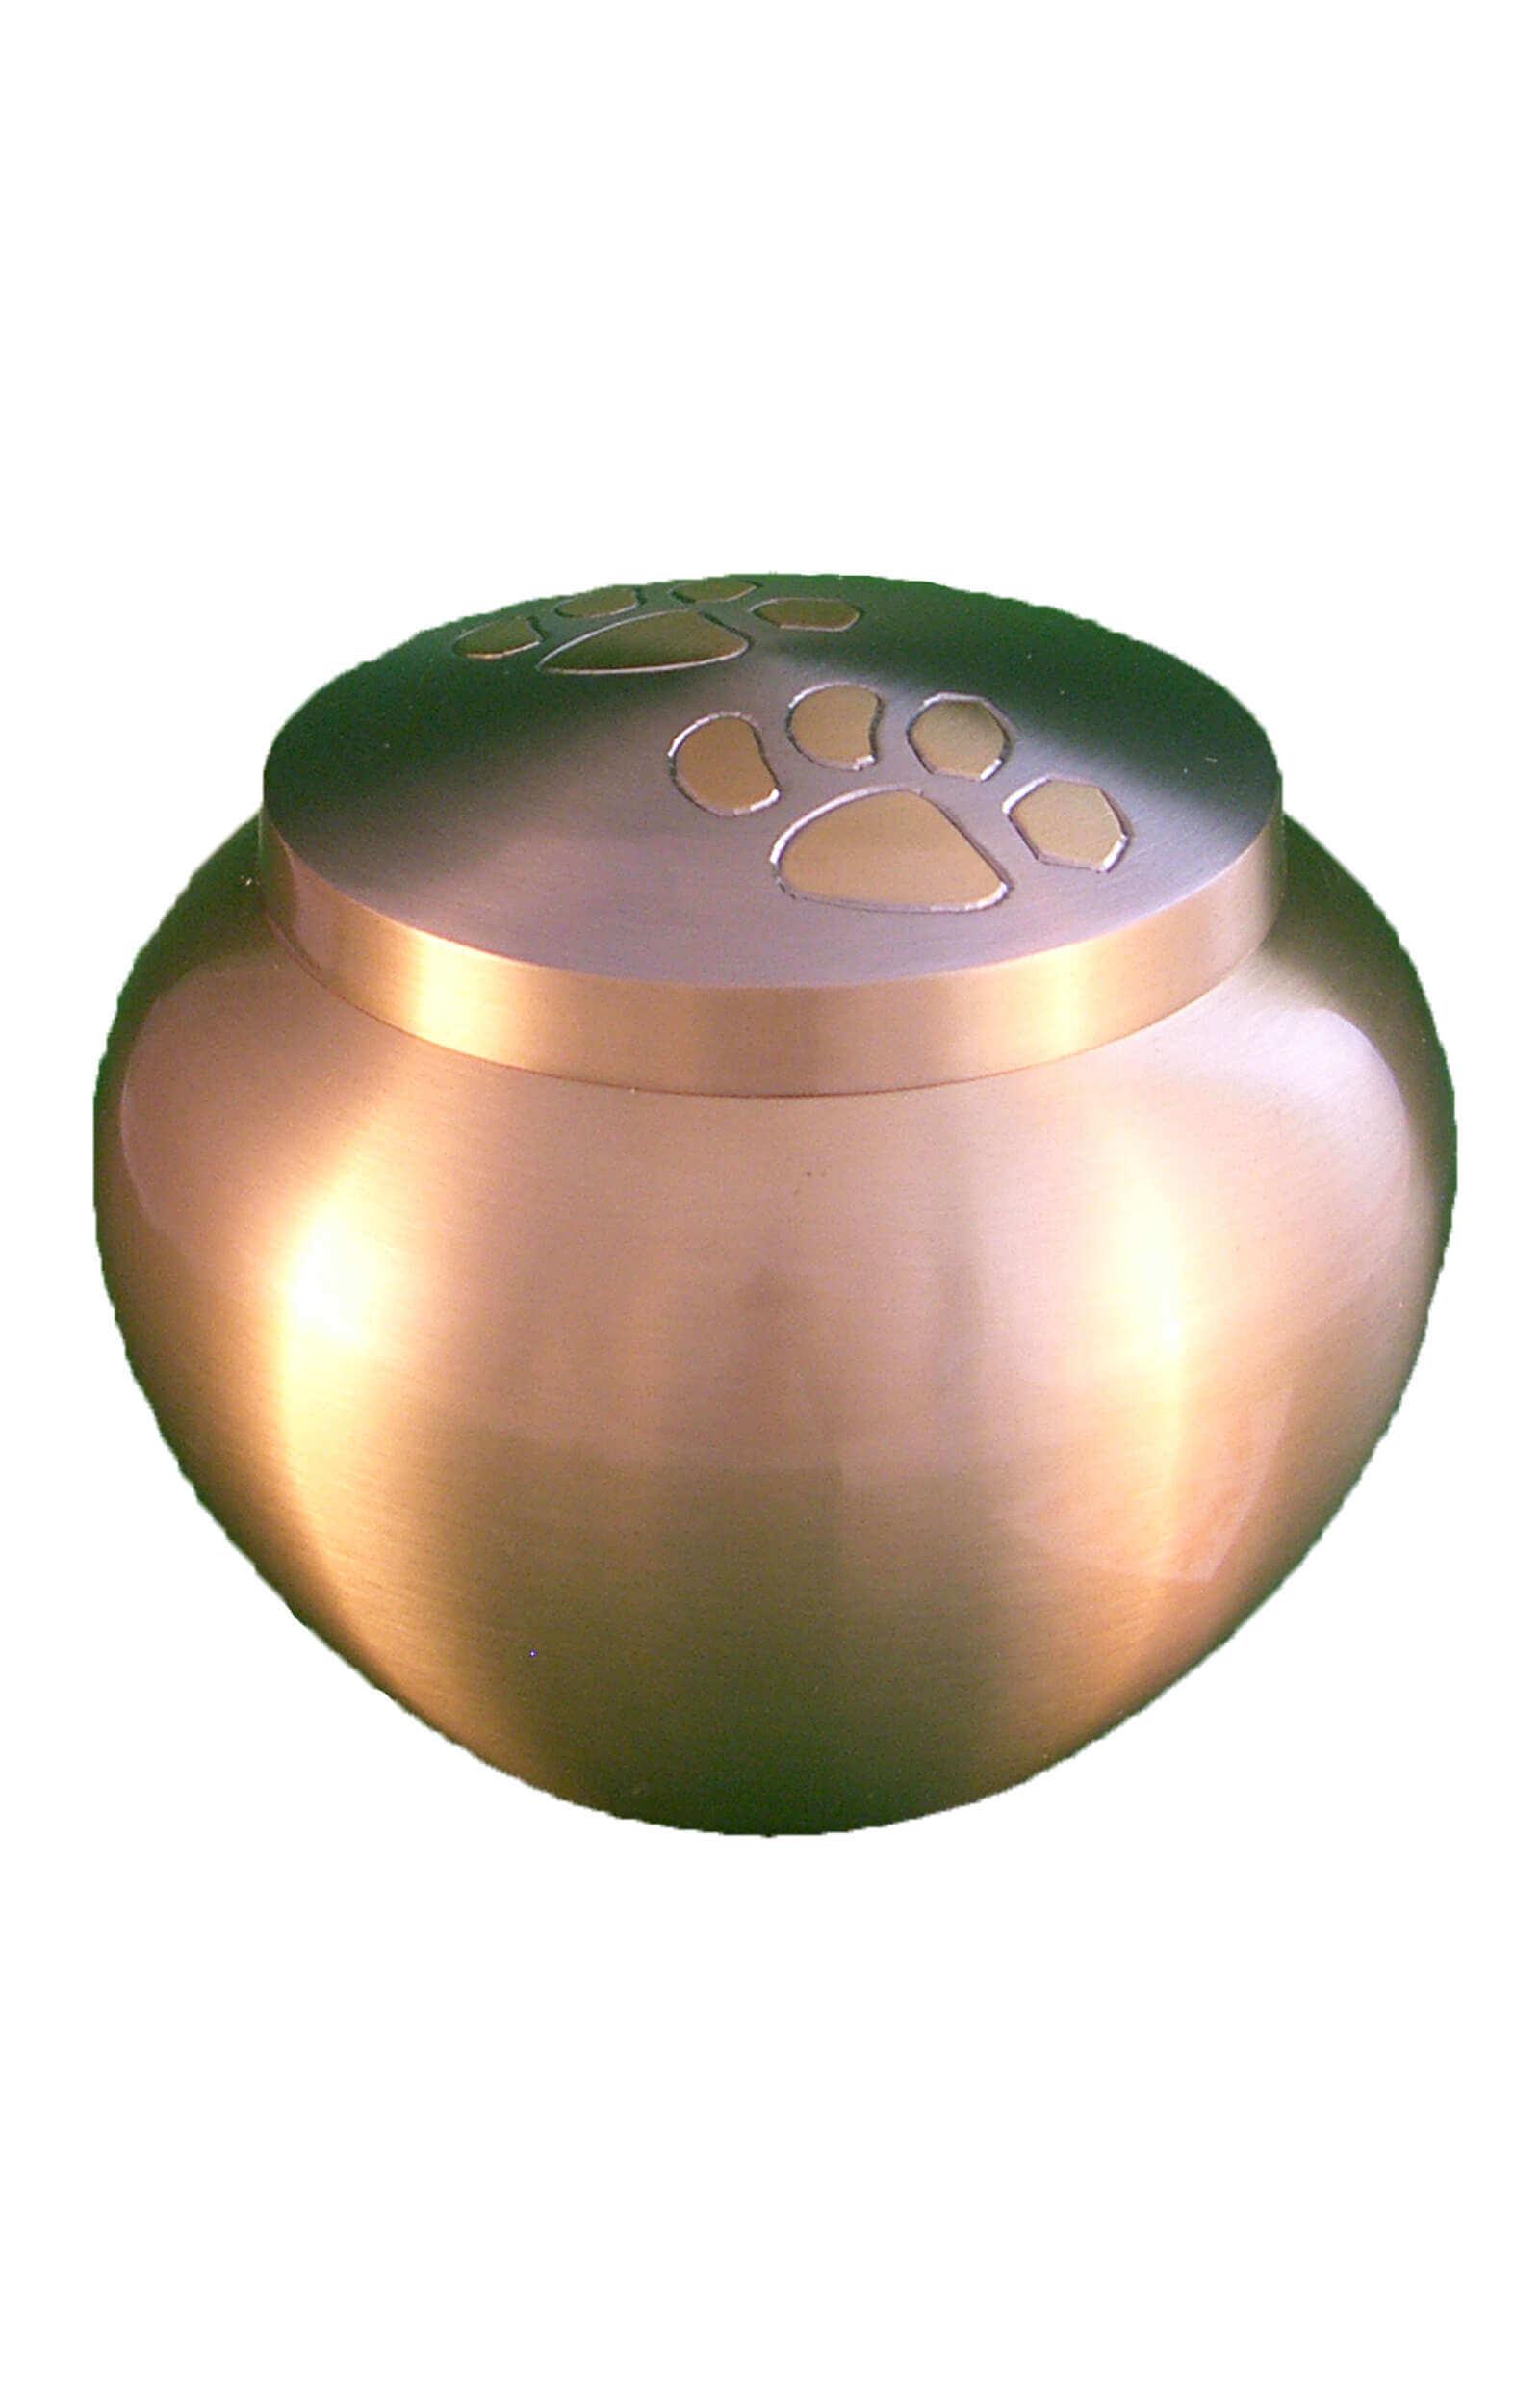 en TIB1545AEXL silver pawprint pet urn.jpg